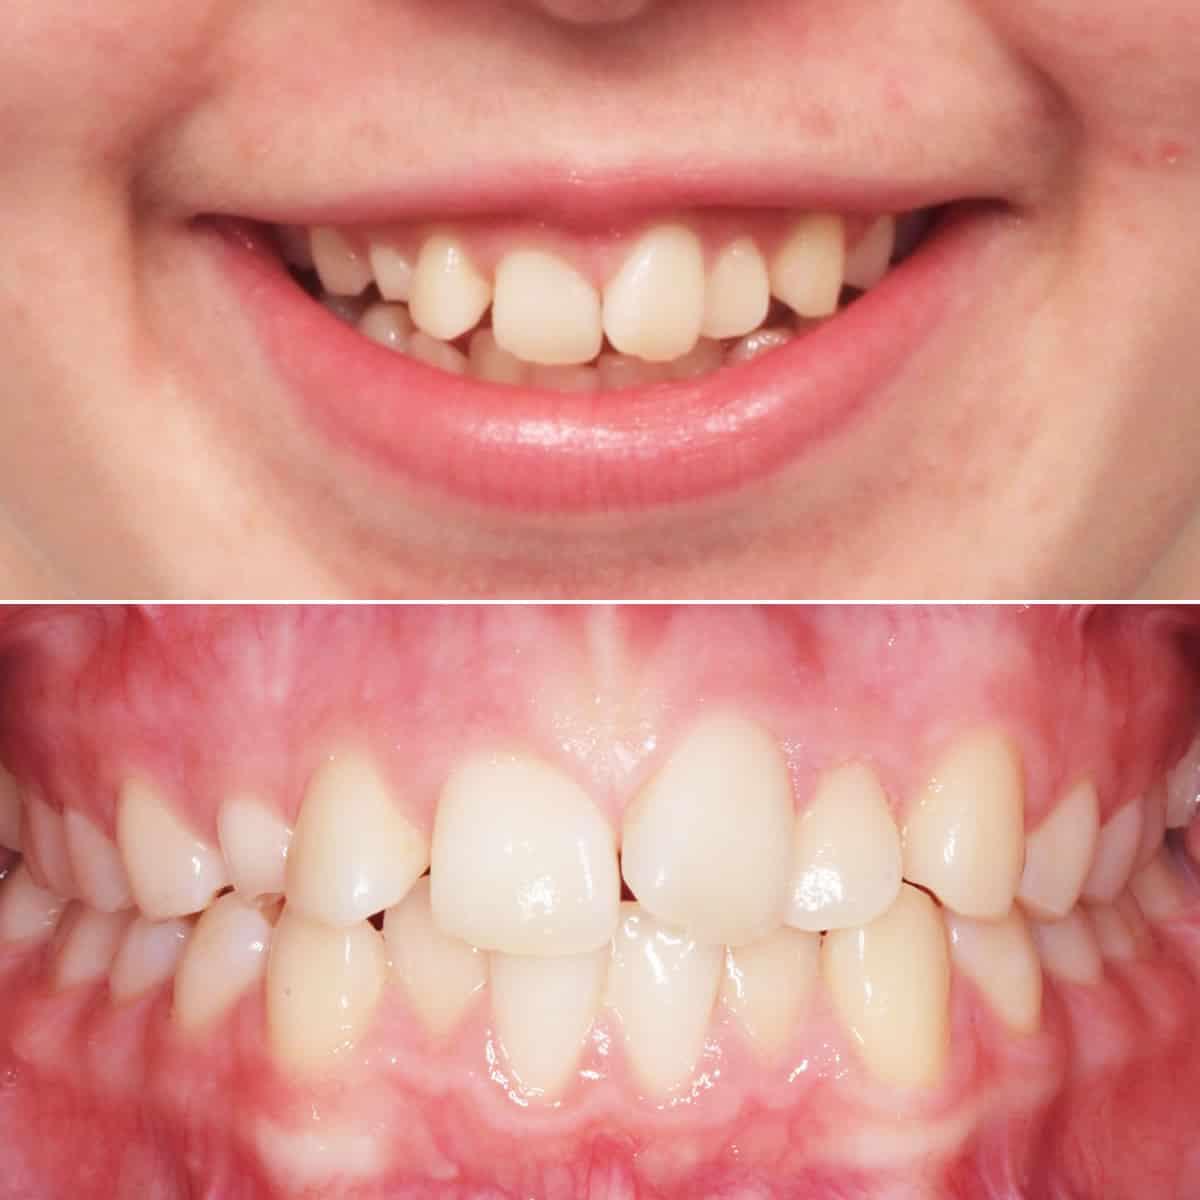 Before orthodontic treatment 05